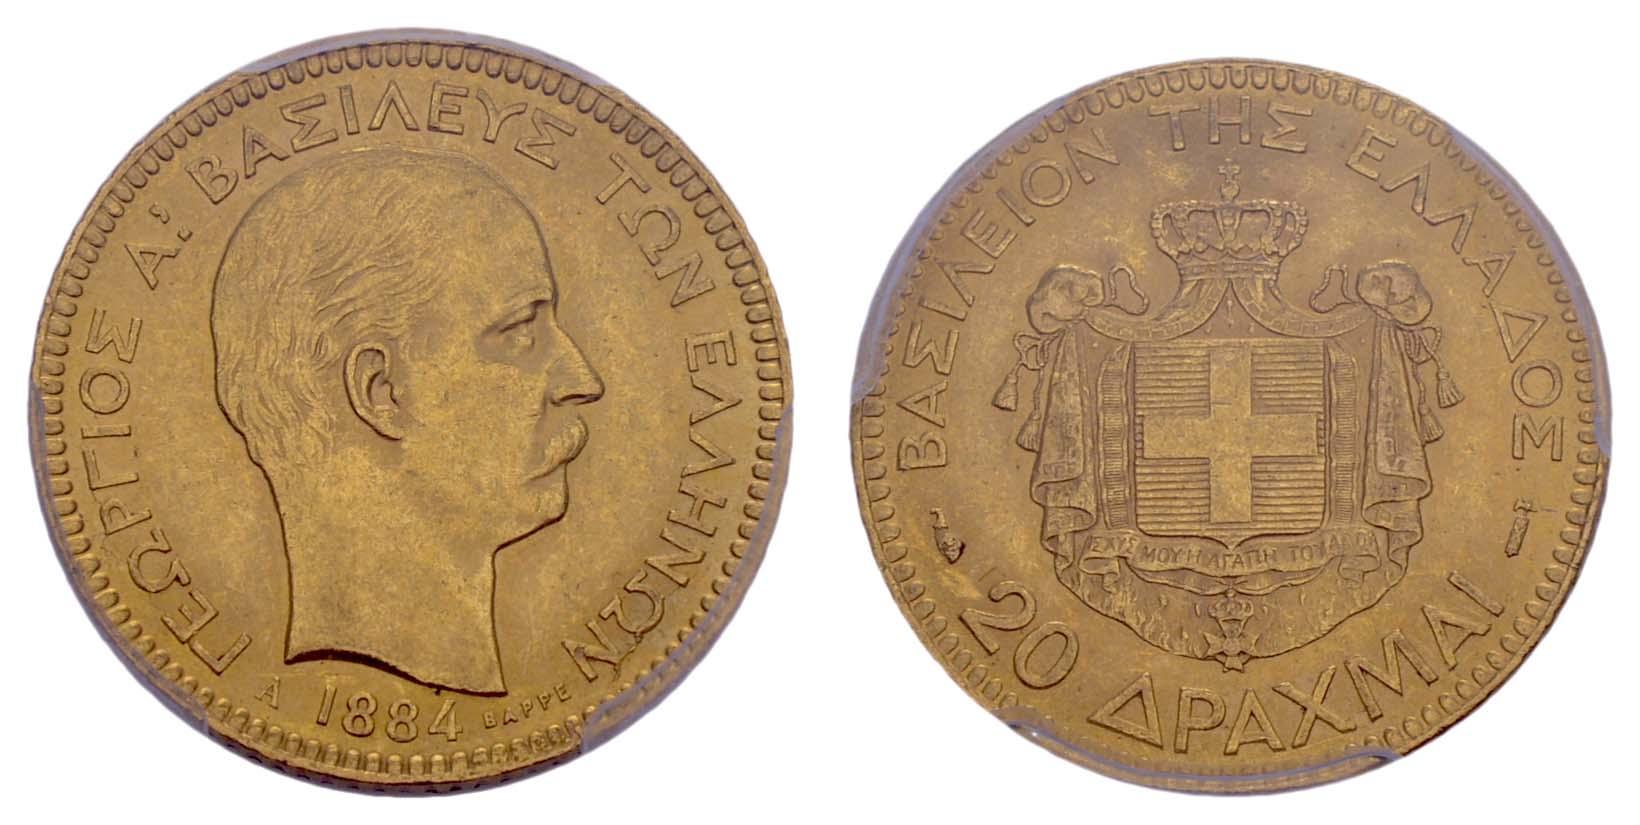 Lot 1559 - europa ab 1800 - Griechenland -  Auktionshaus Ulrich Felzmann GmbH & Co. KG Coins single lots